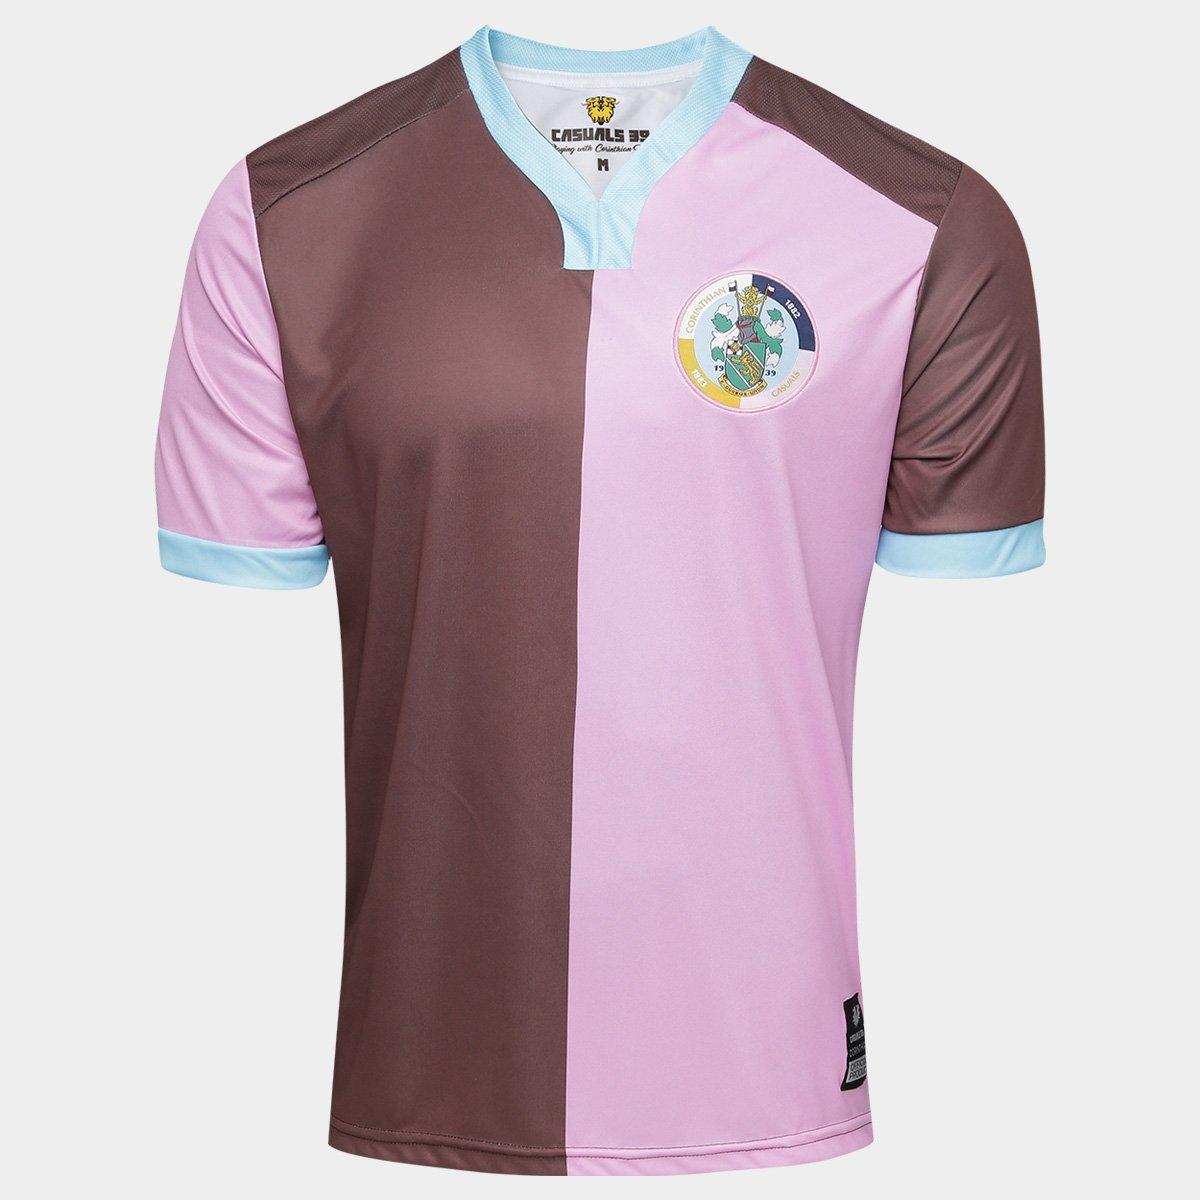 Camisa Corinthian Casuals Home 17 18 Torcedor - Masculina - Marrom e ... 50860dd60e9d8